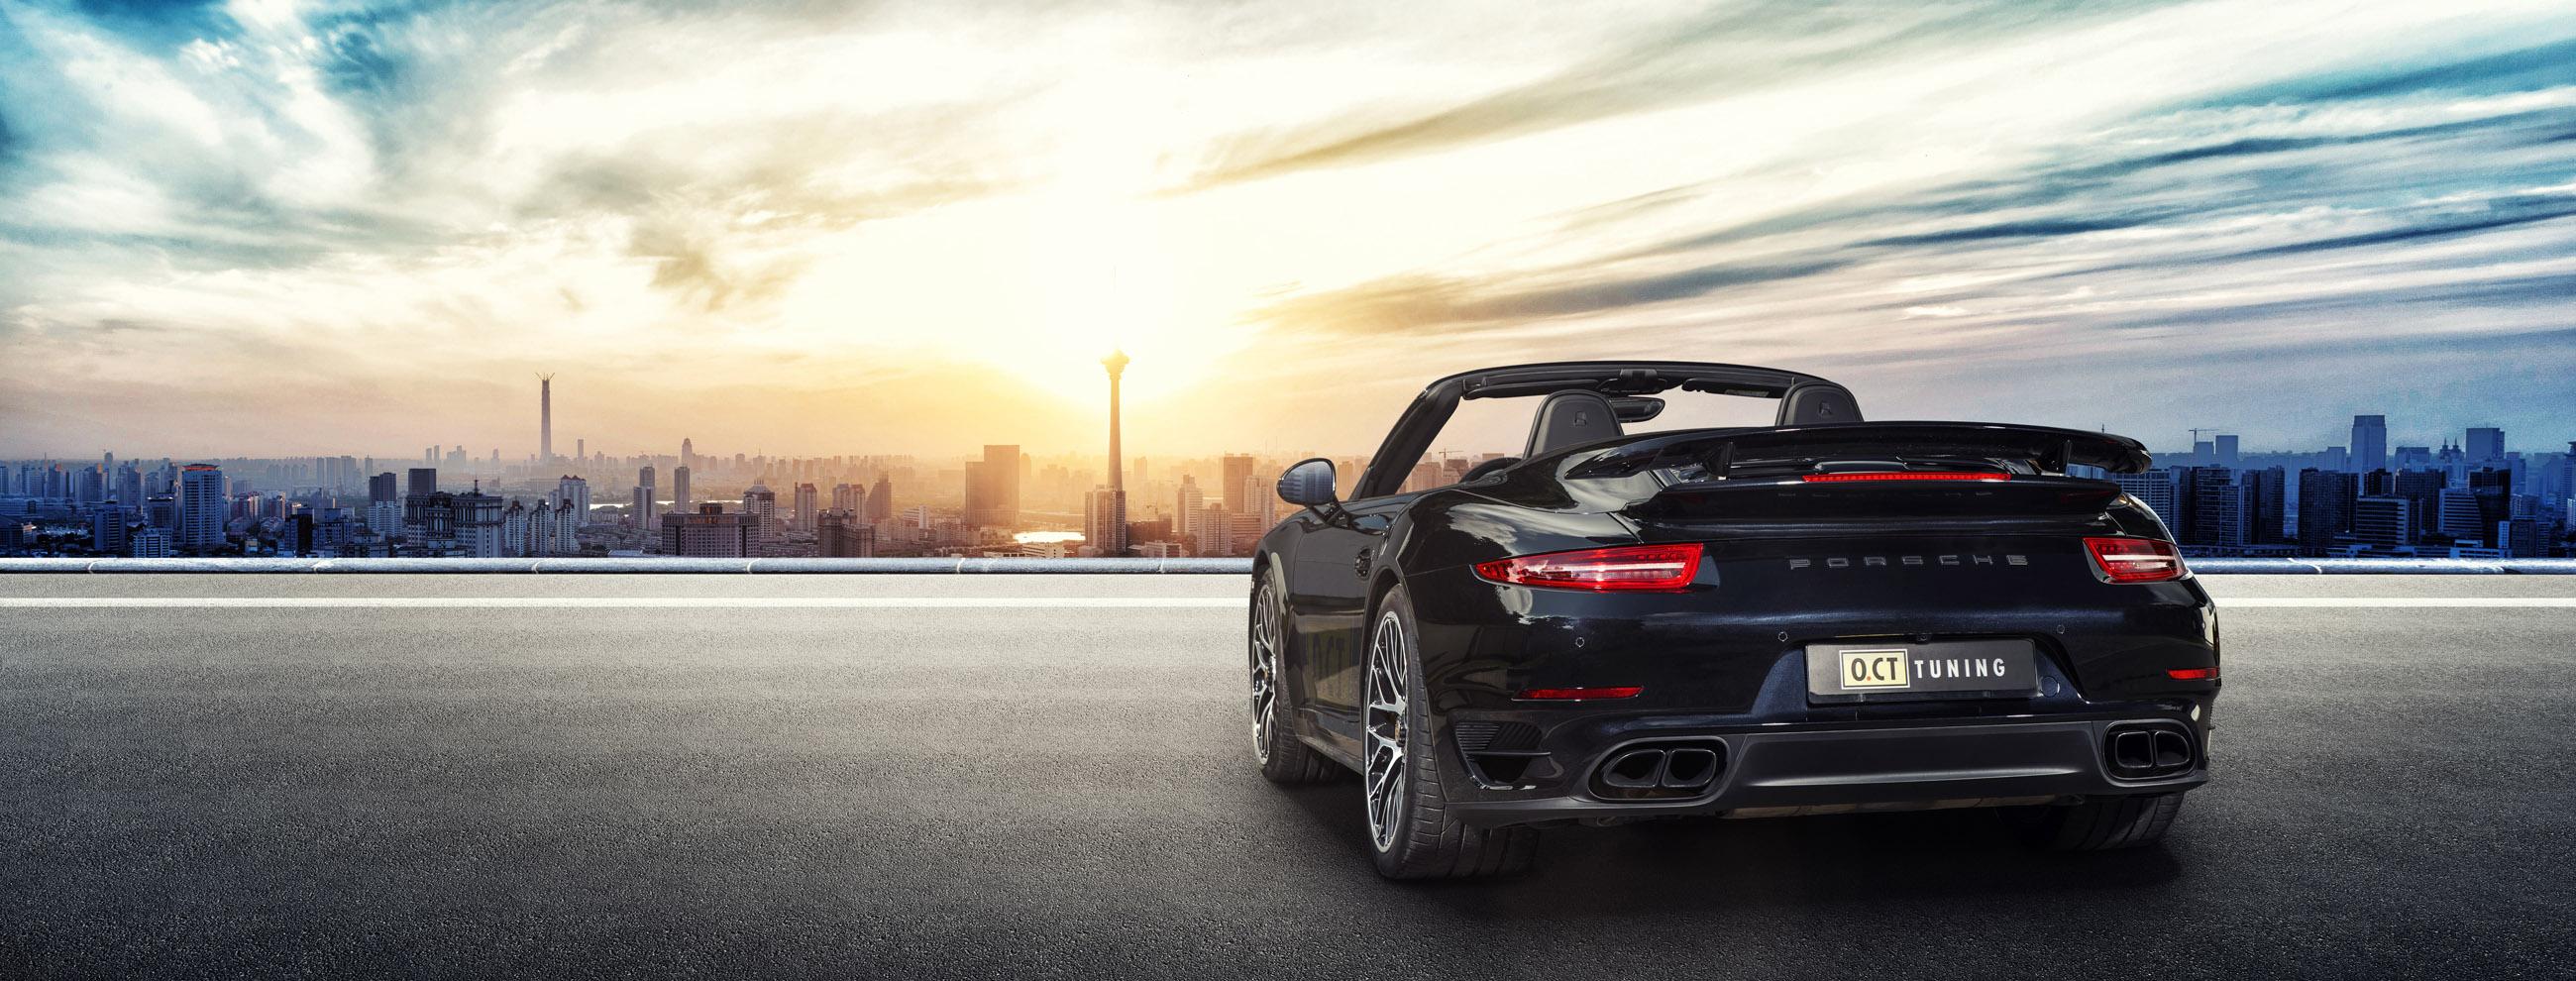 2015 OCT Porsche 911 Turbo S